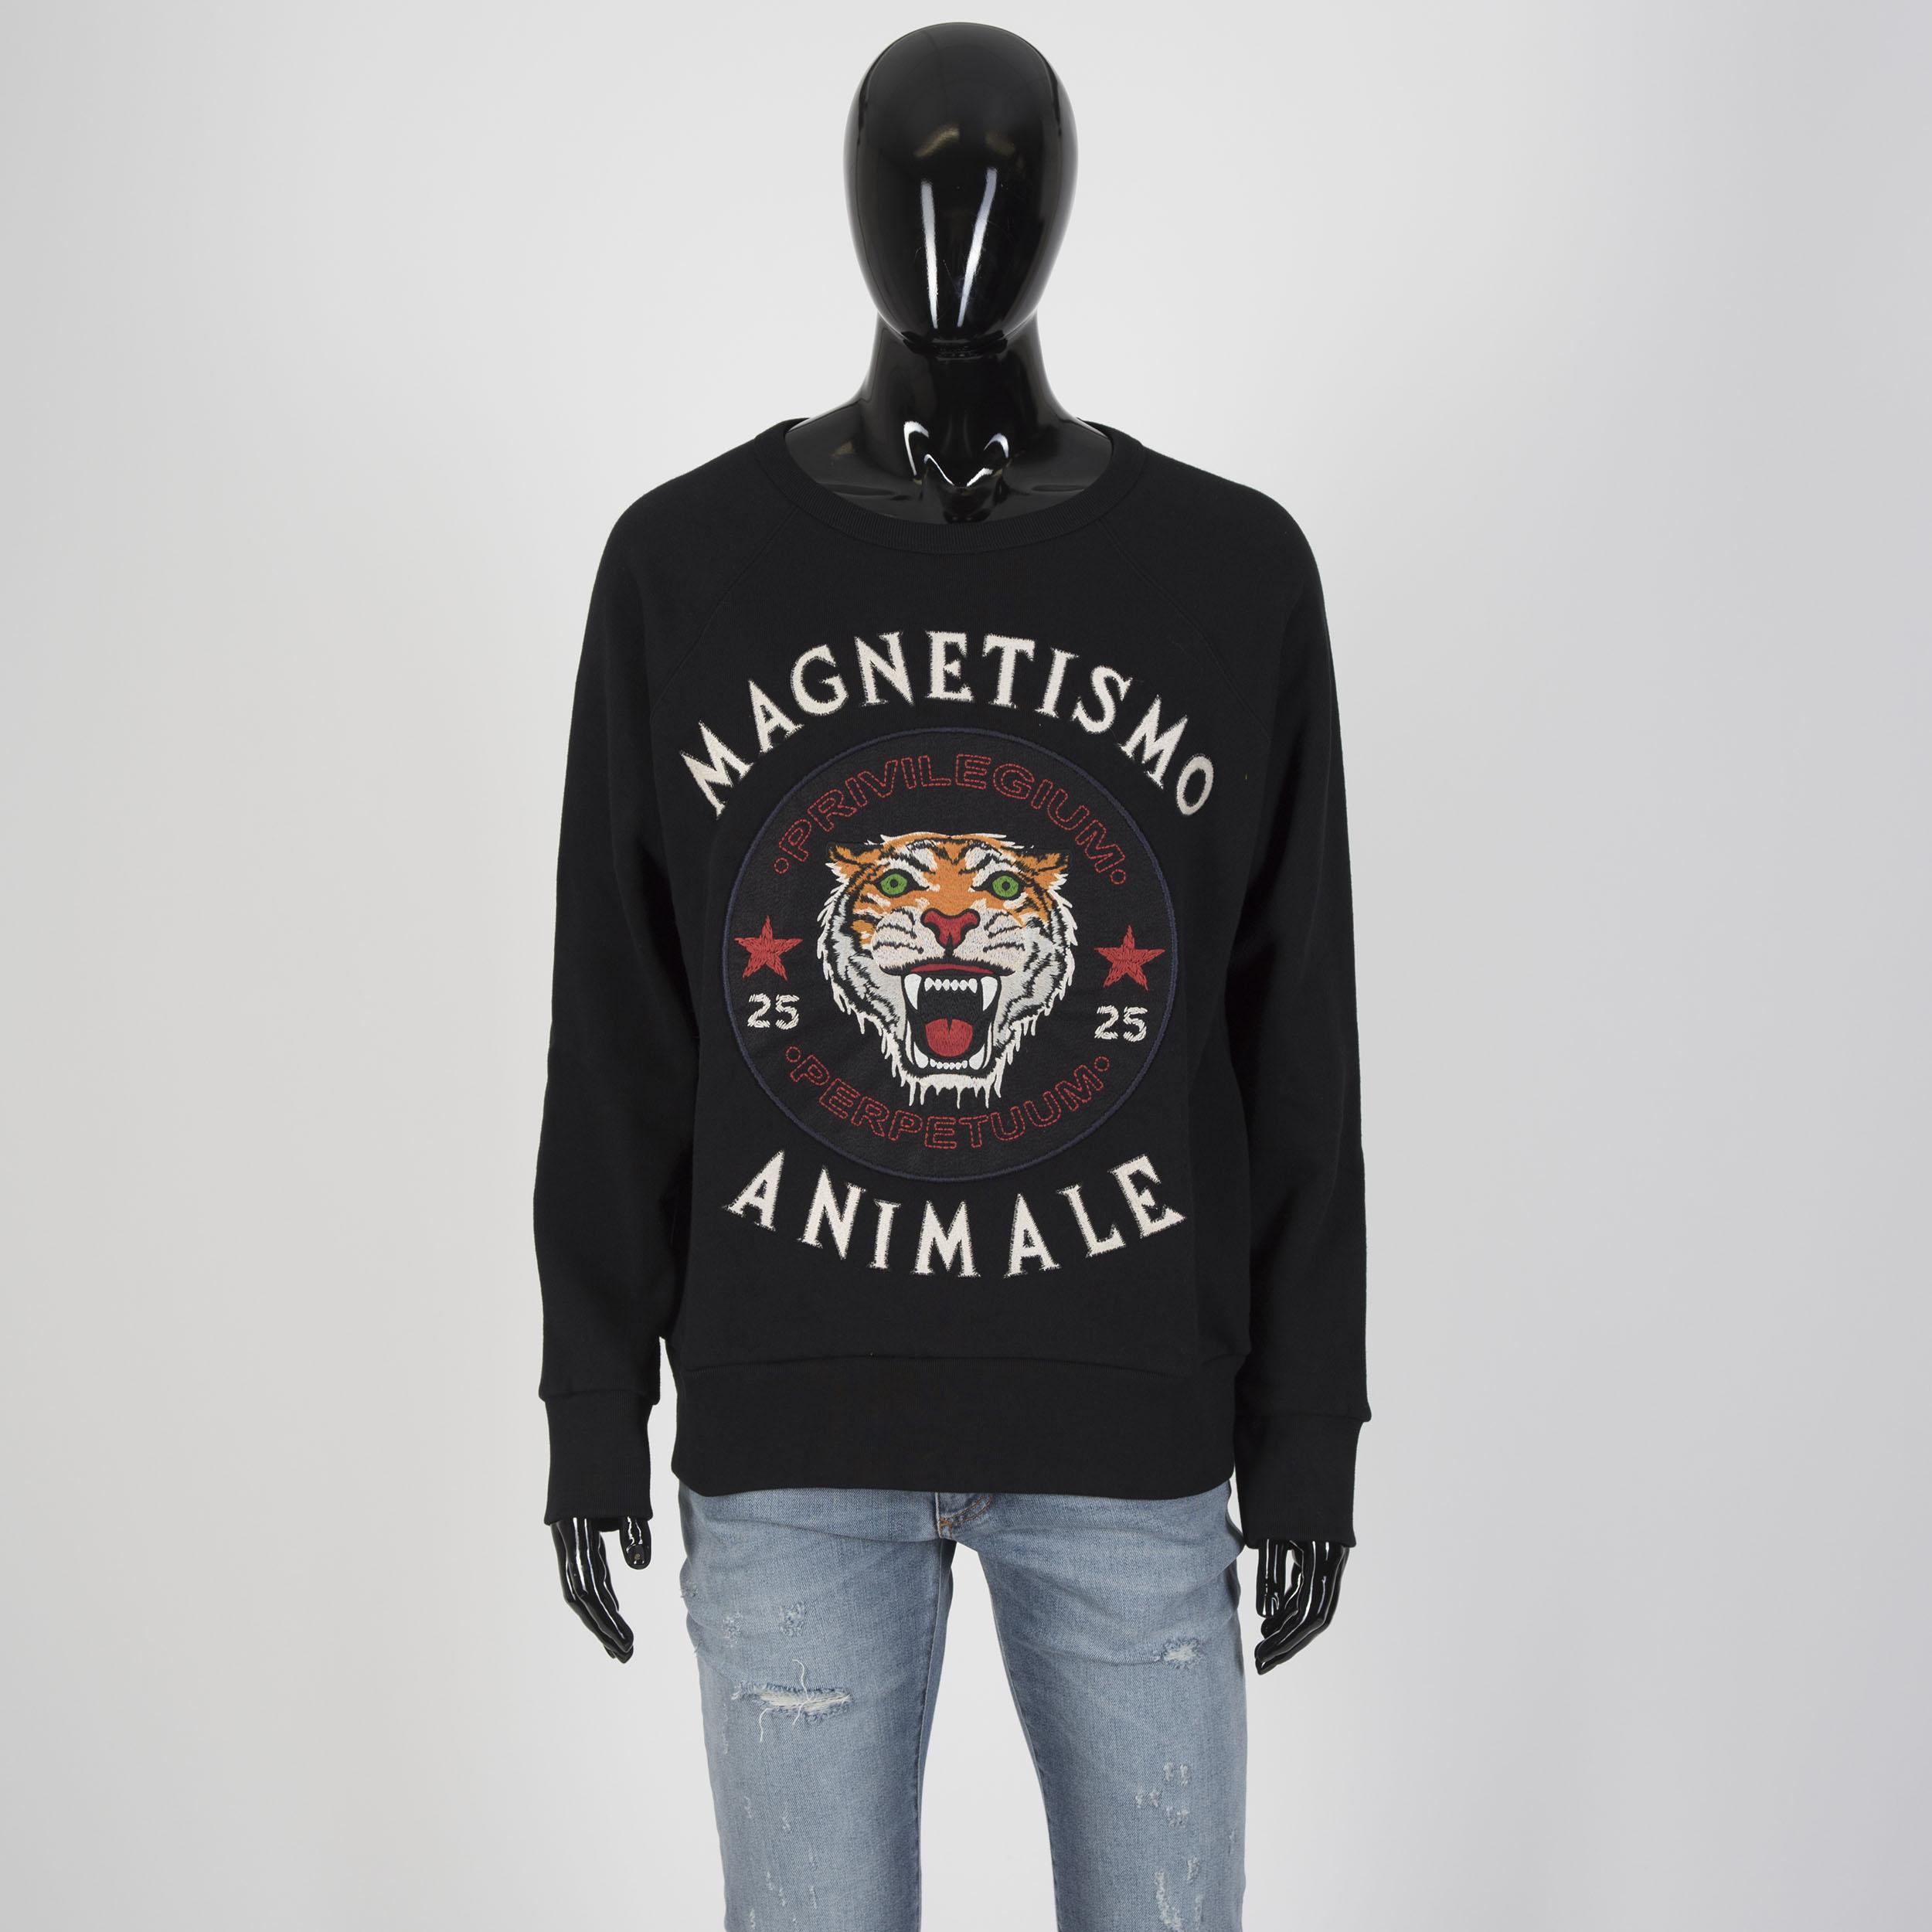 861ff166ec4 Details about GUCCI 1450  Magnetismo Animale Crewneck Sweatshirt In Black  Cotton